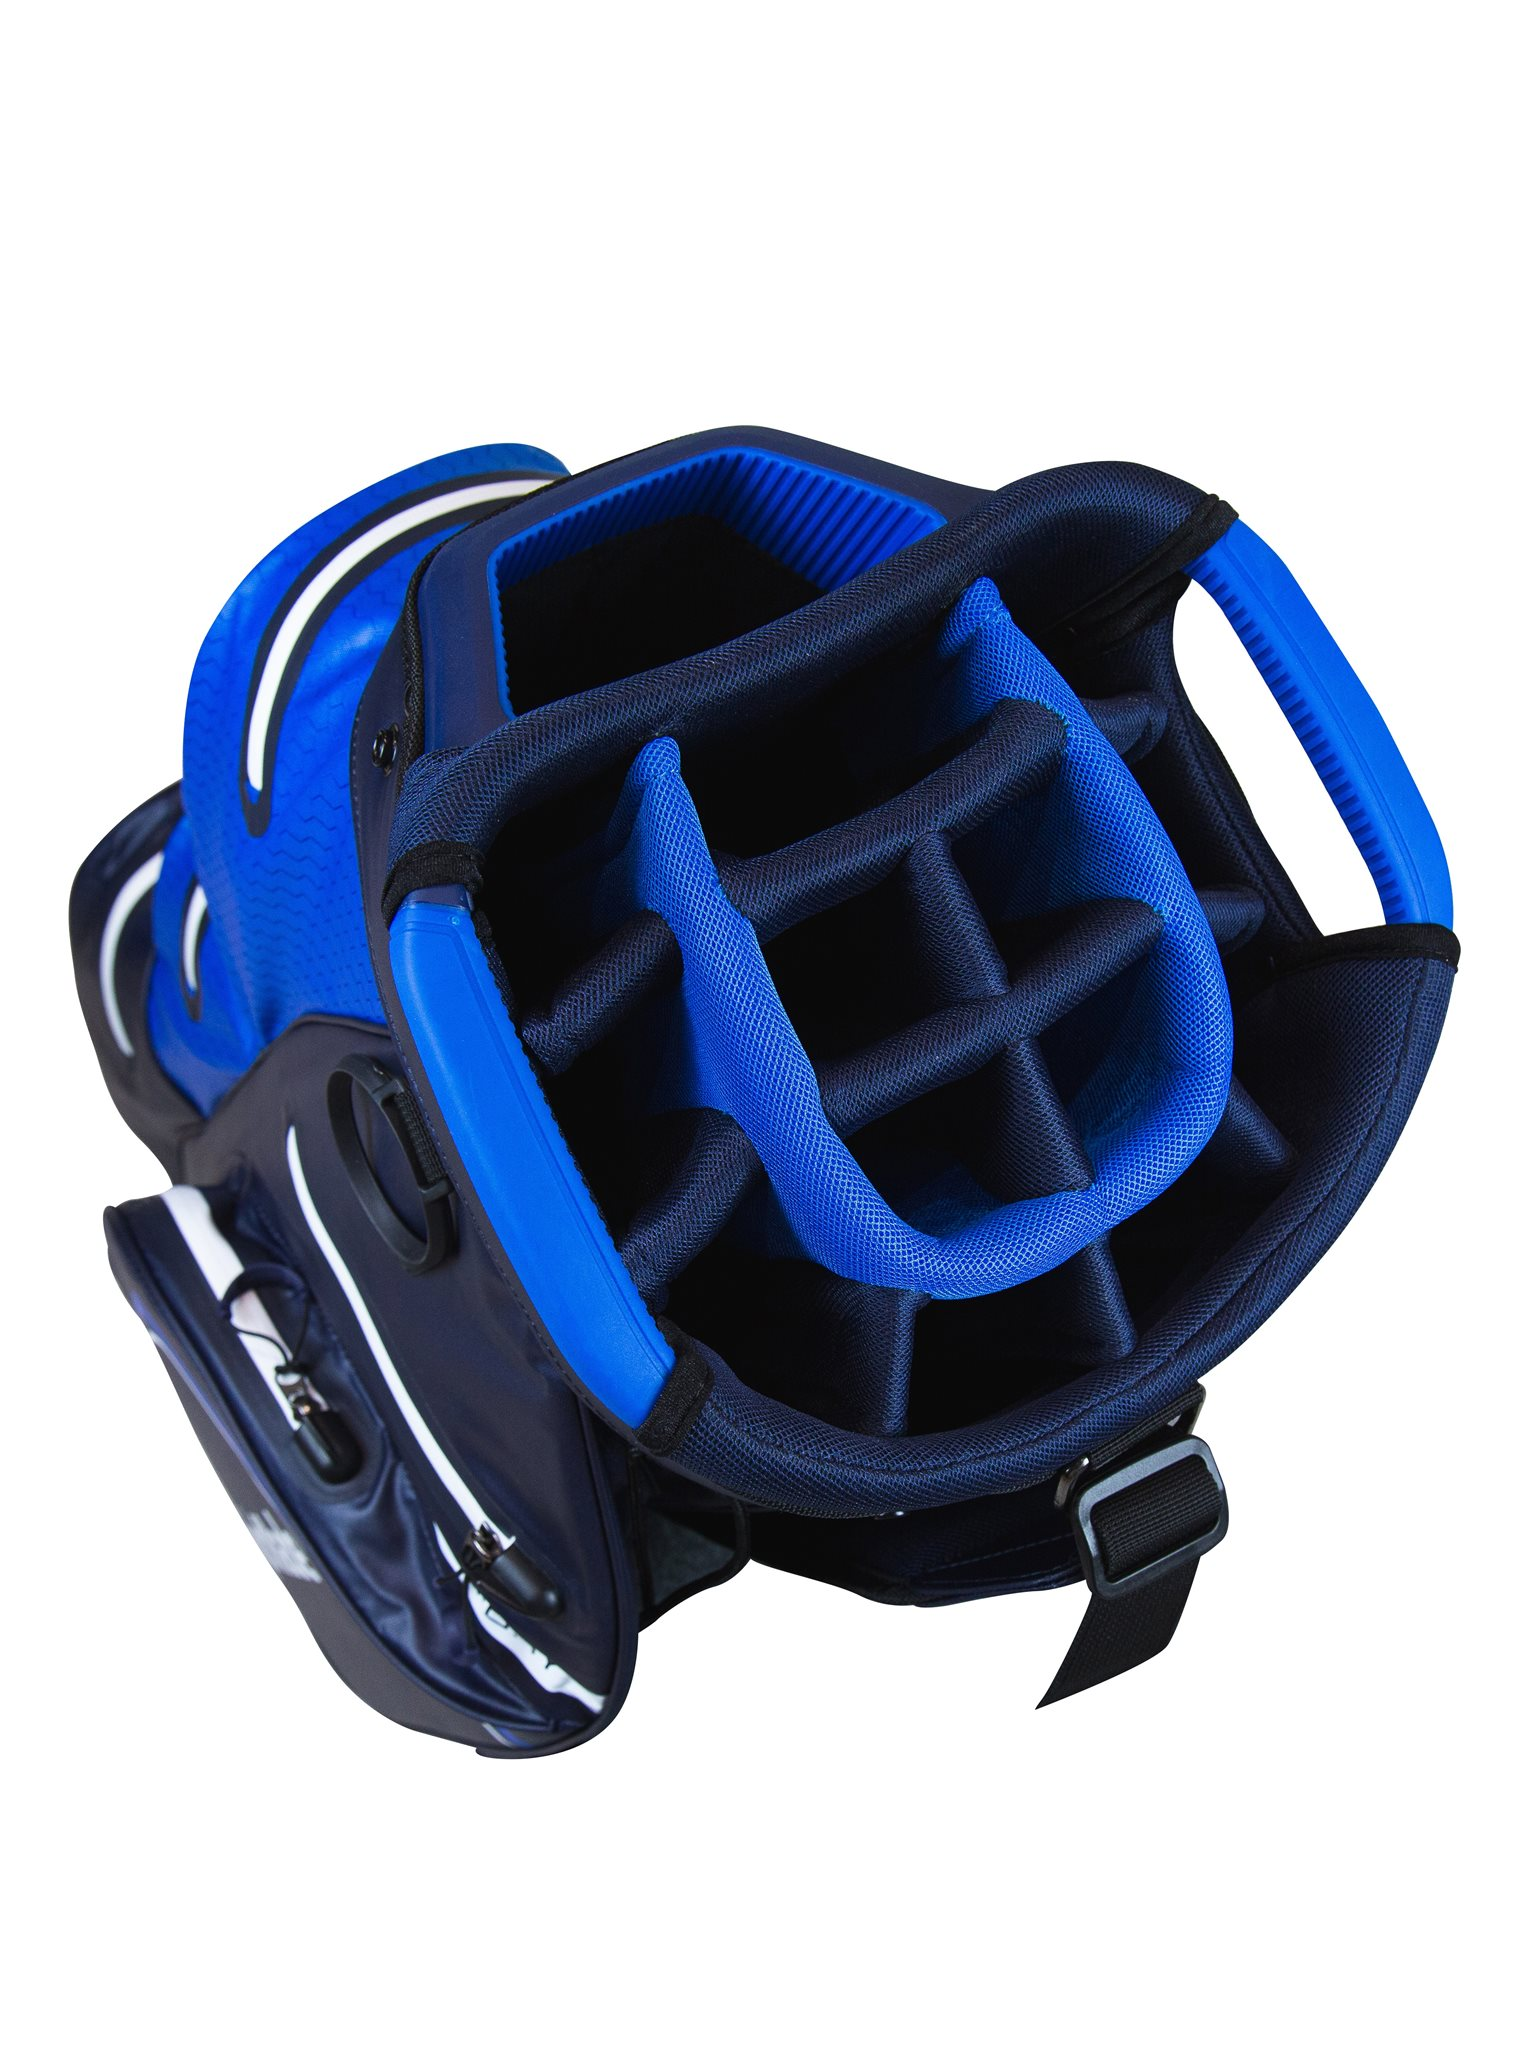 TaylorMade golftas Storm-Dry Waterproof Cart Bag navy-blauw